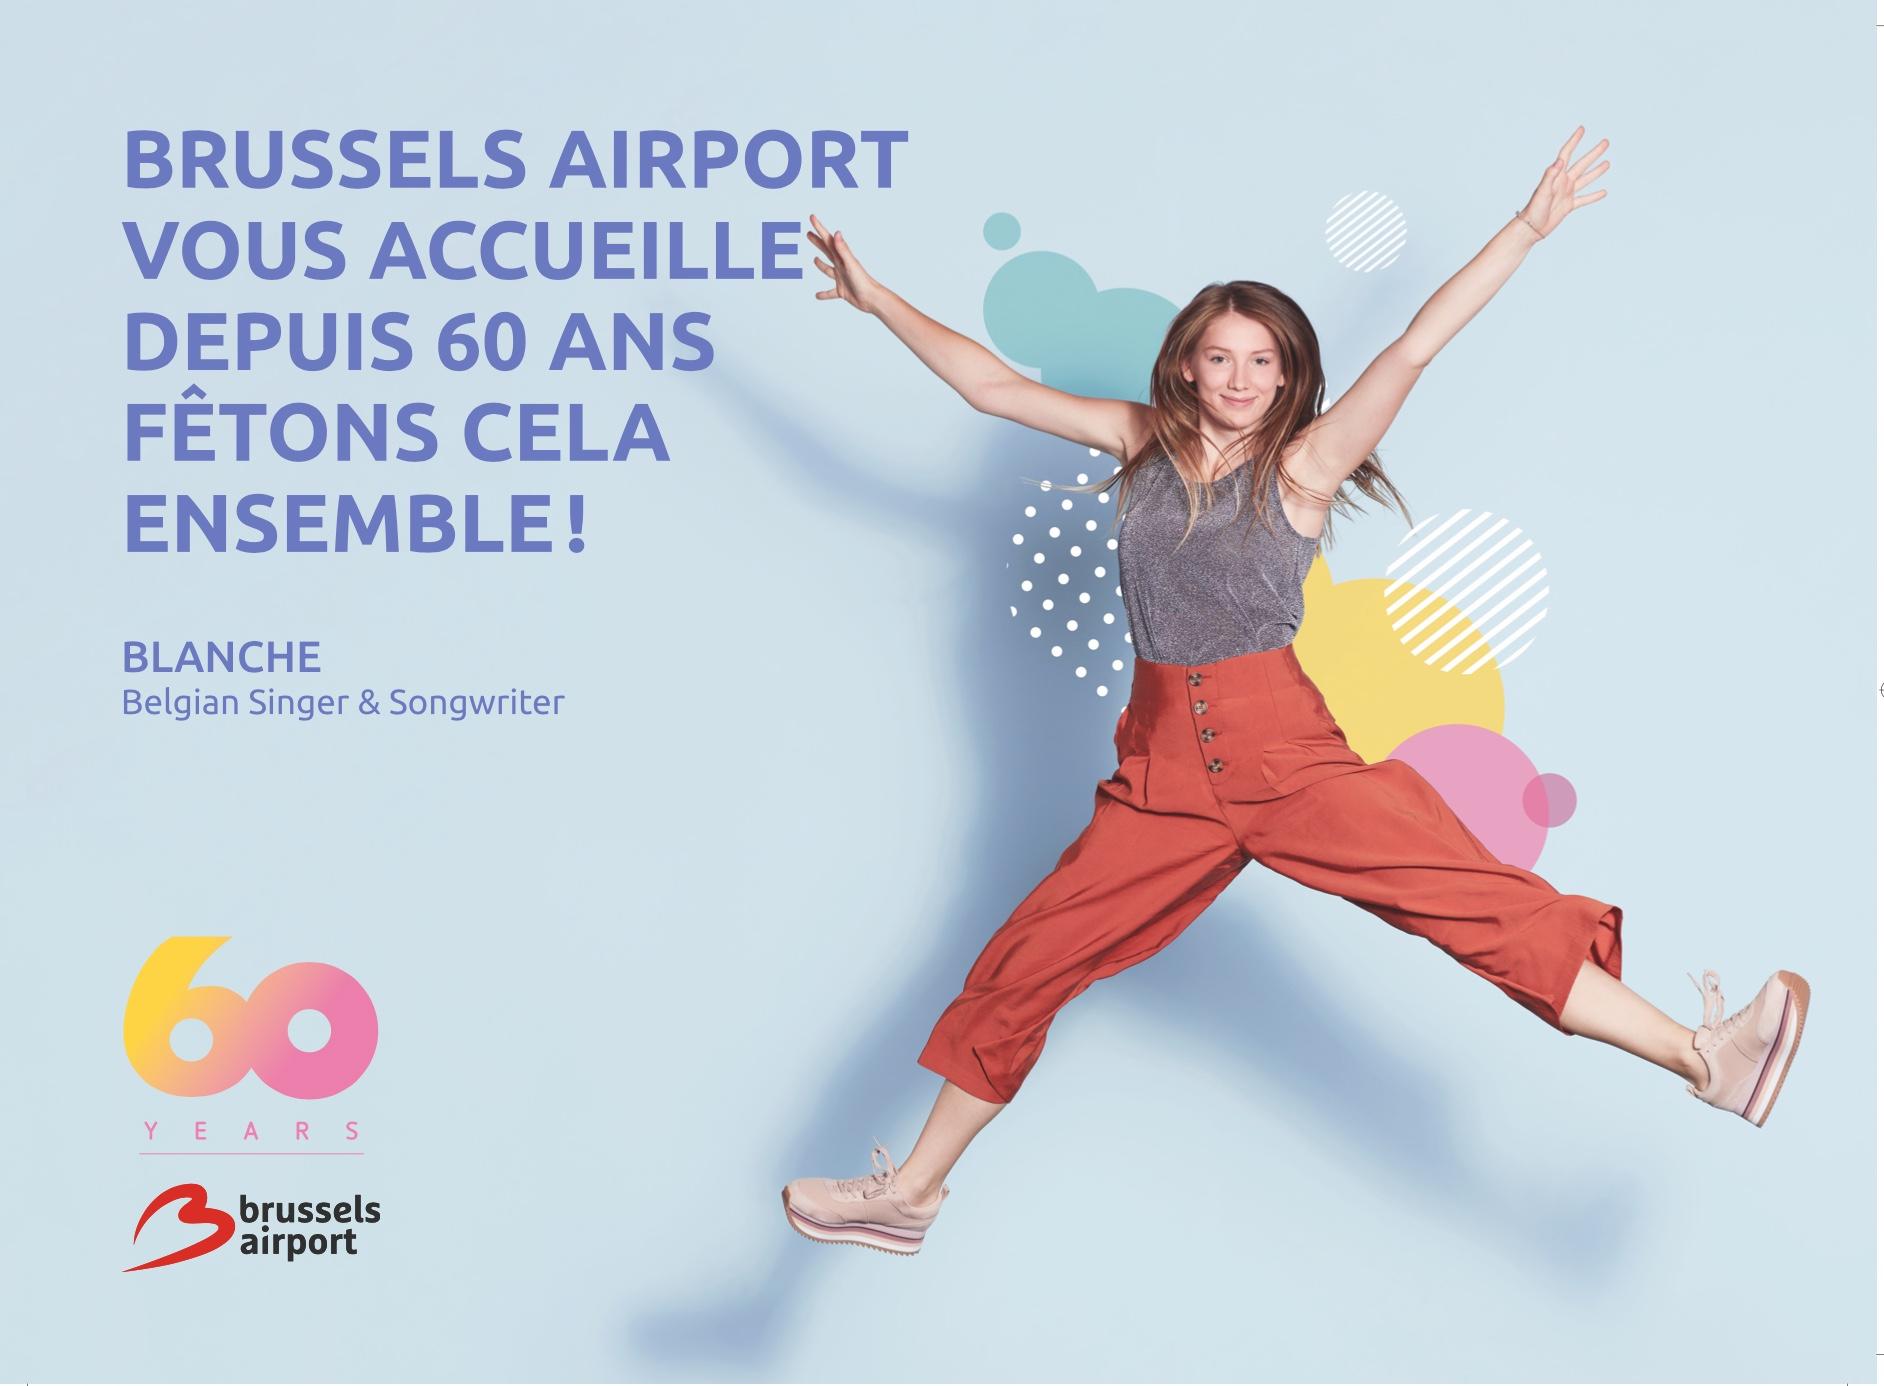 Brussels Airport - Design & graphisme